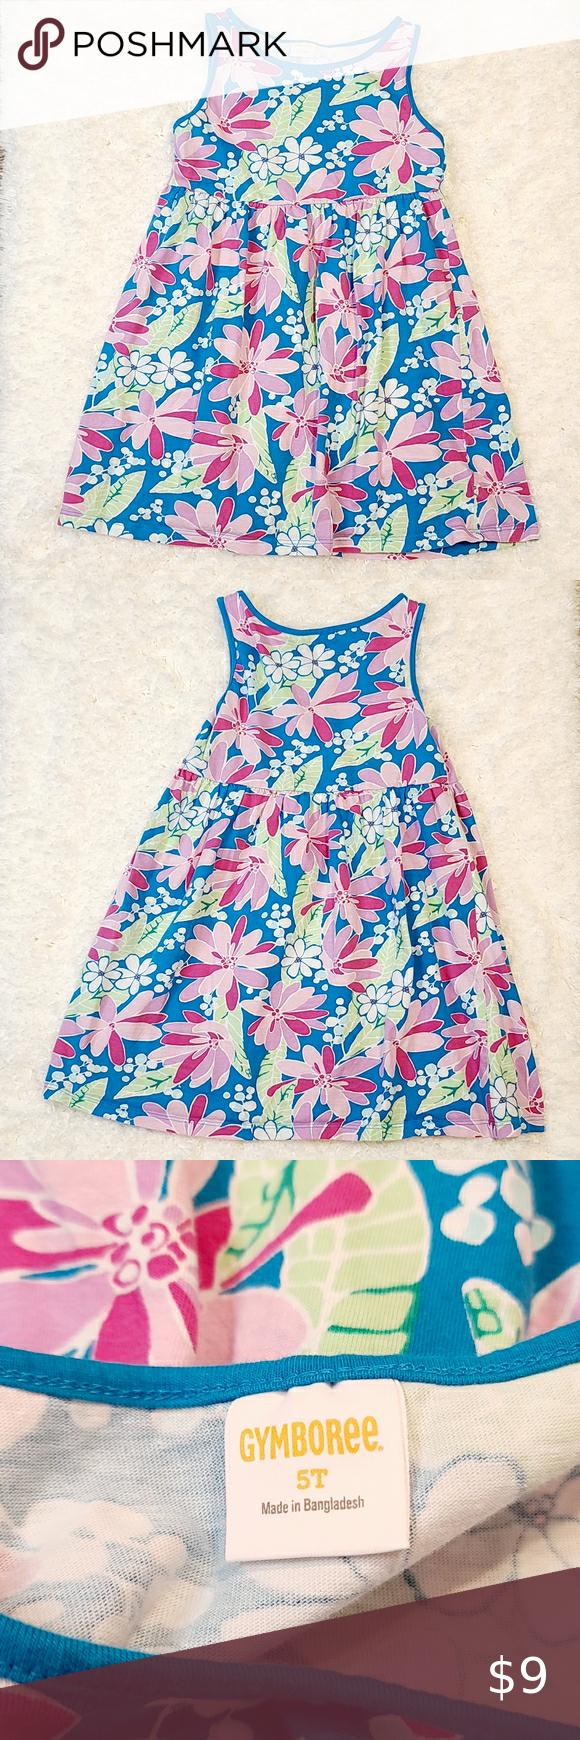 Gymboree Girls Blue Floral Dress Size 5t Gymboree Girls Blue Floral Dress Size 5t Material 100 Cot Little Girl Dresses Floral Blue Dress Girls Ruffle Dress [ 1740 x 580 Pixel ]